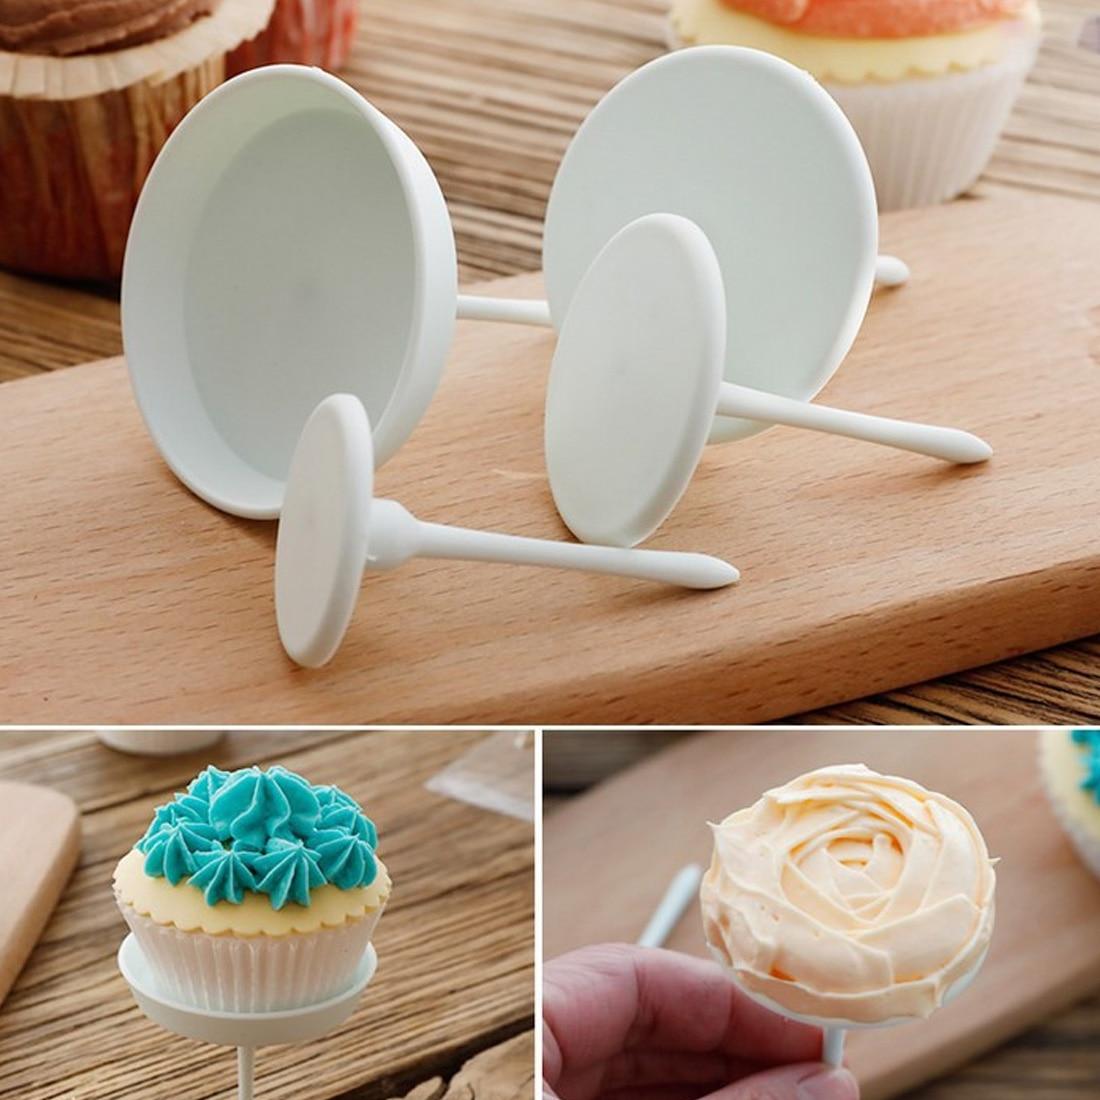 Flower Nail Cake: High Sale 4Pcs/Set Flower Needle Nail Baking Tools Cake